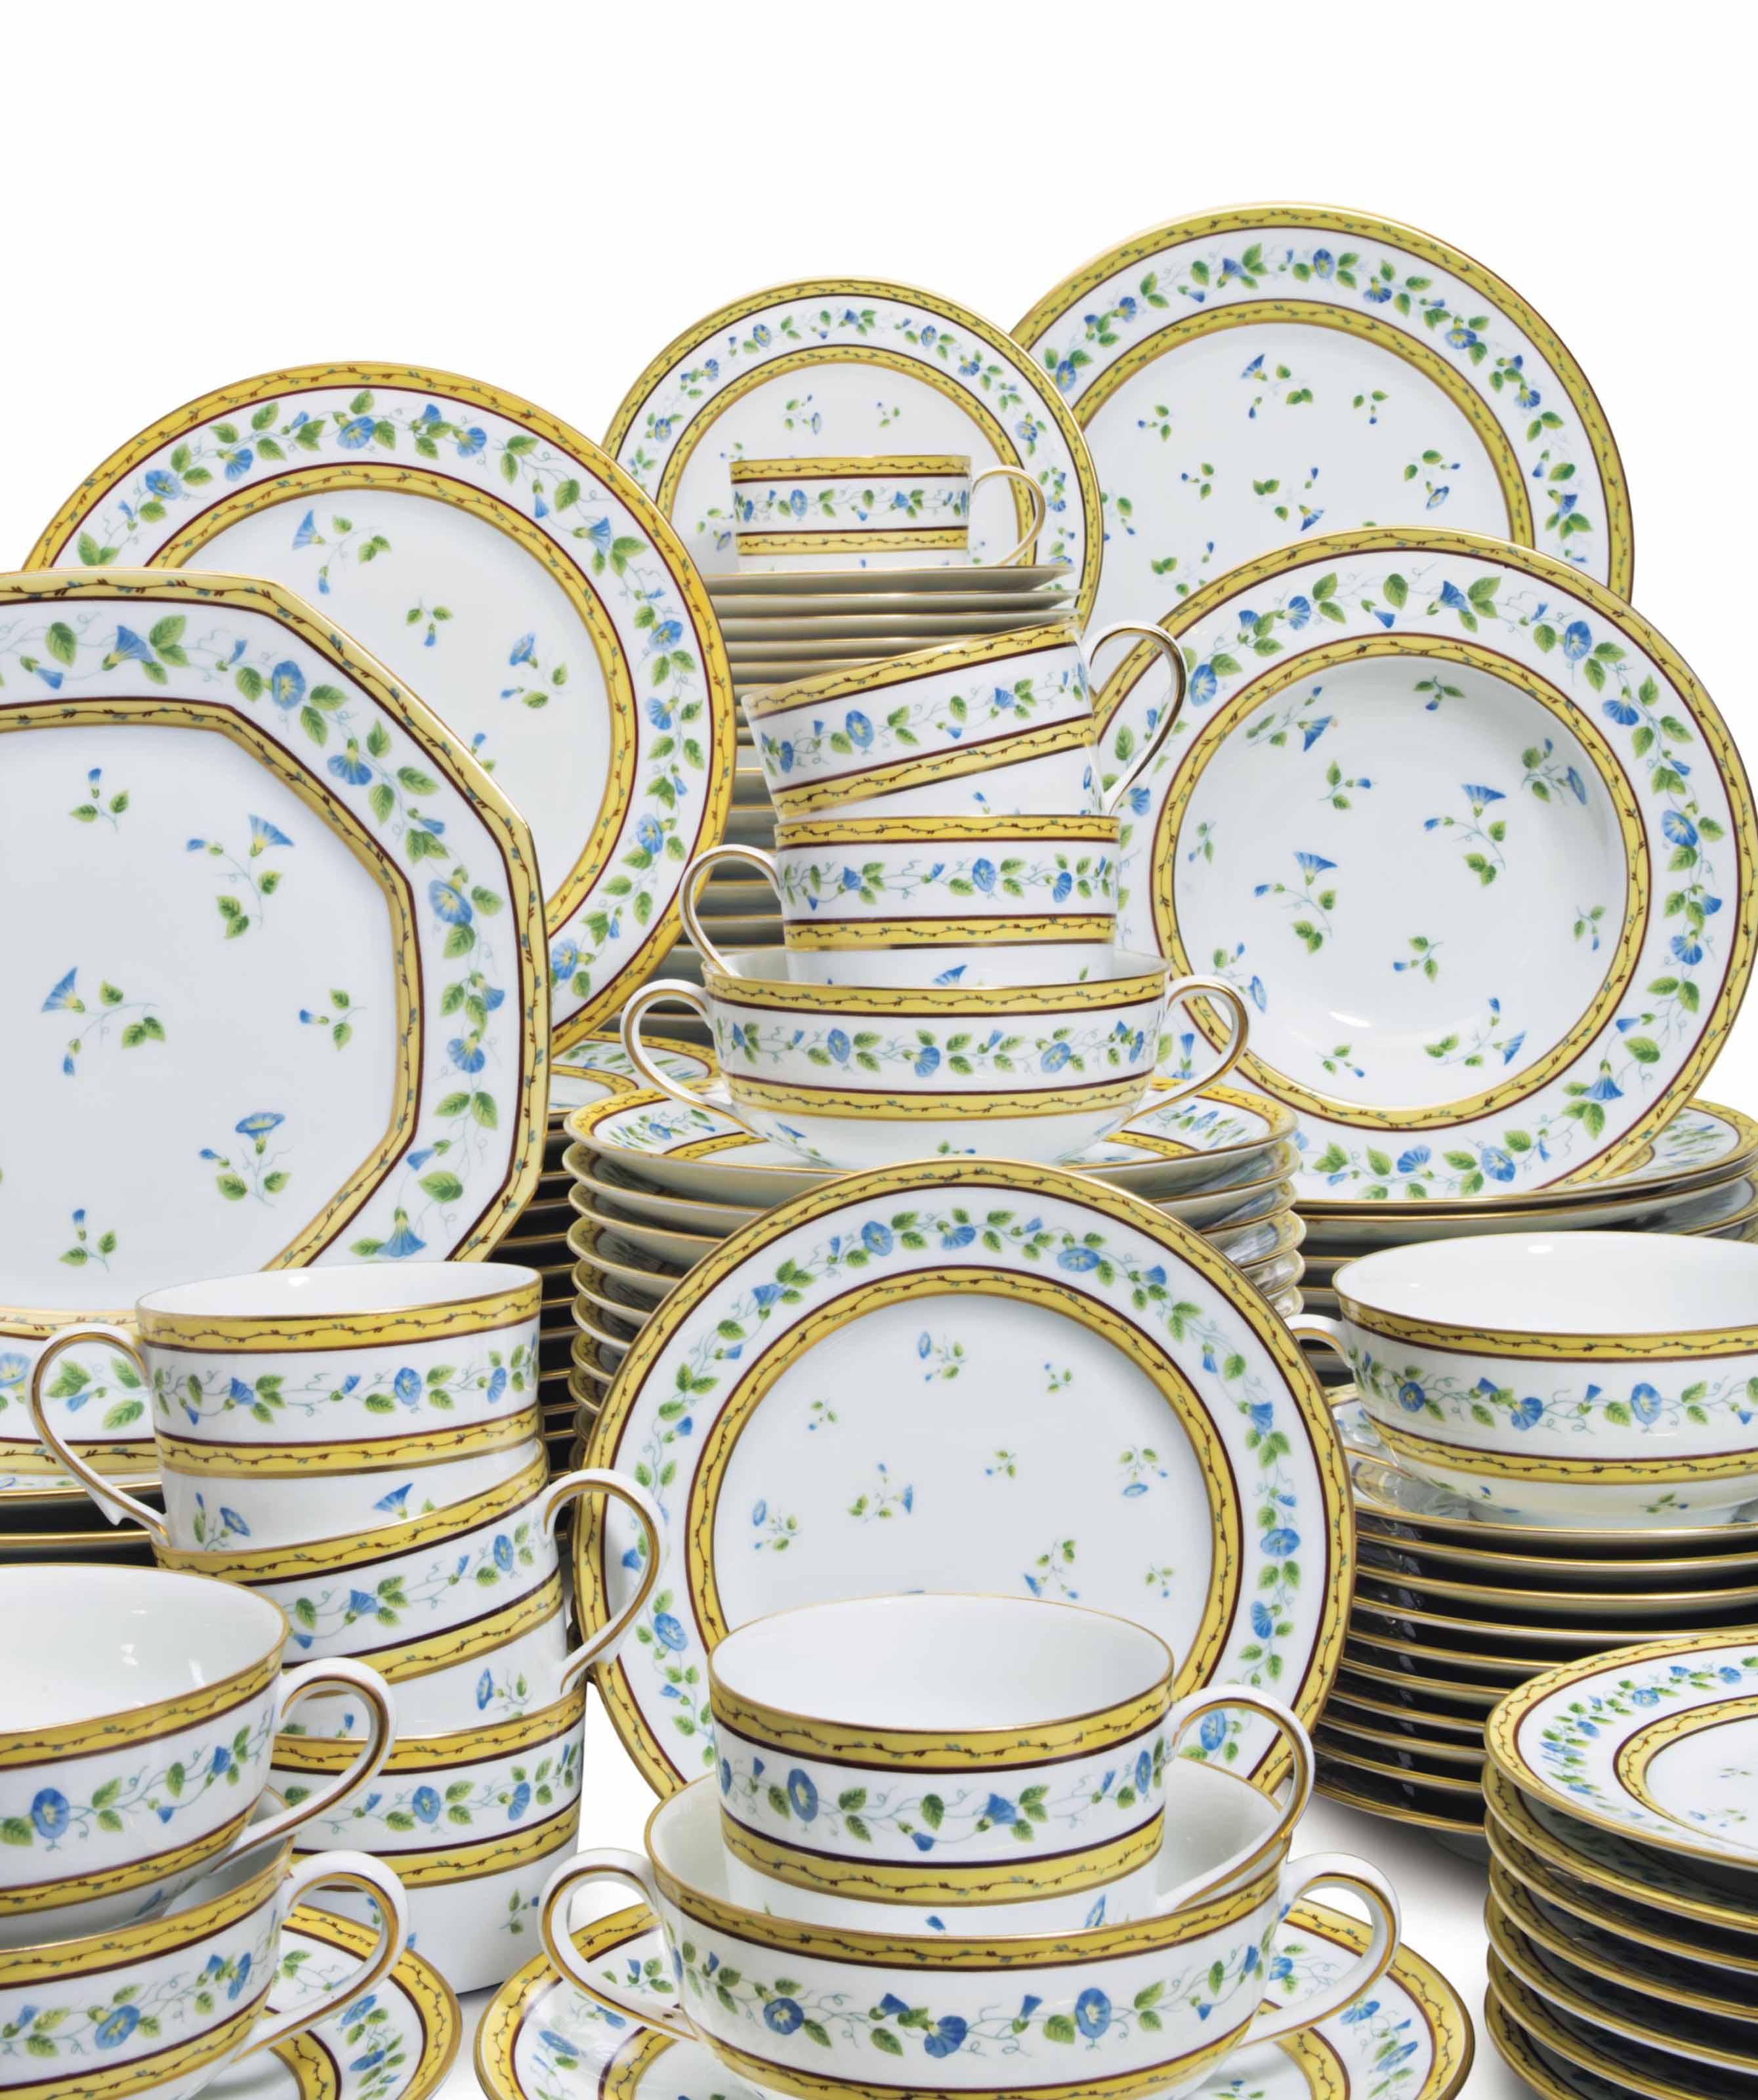 A LIMOGES (RAYNAUD) PORCELAIN PART-DINNER SERVICE